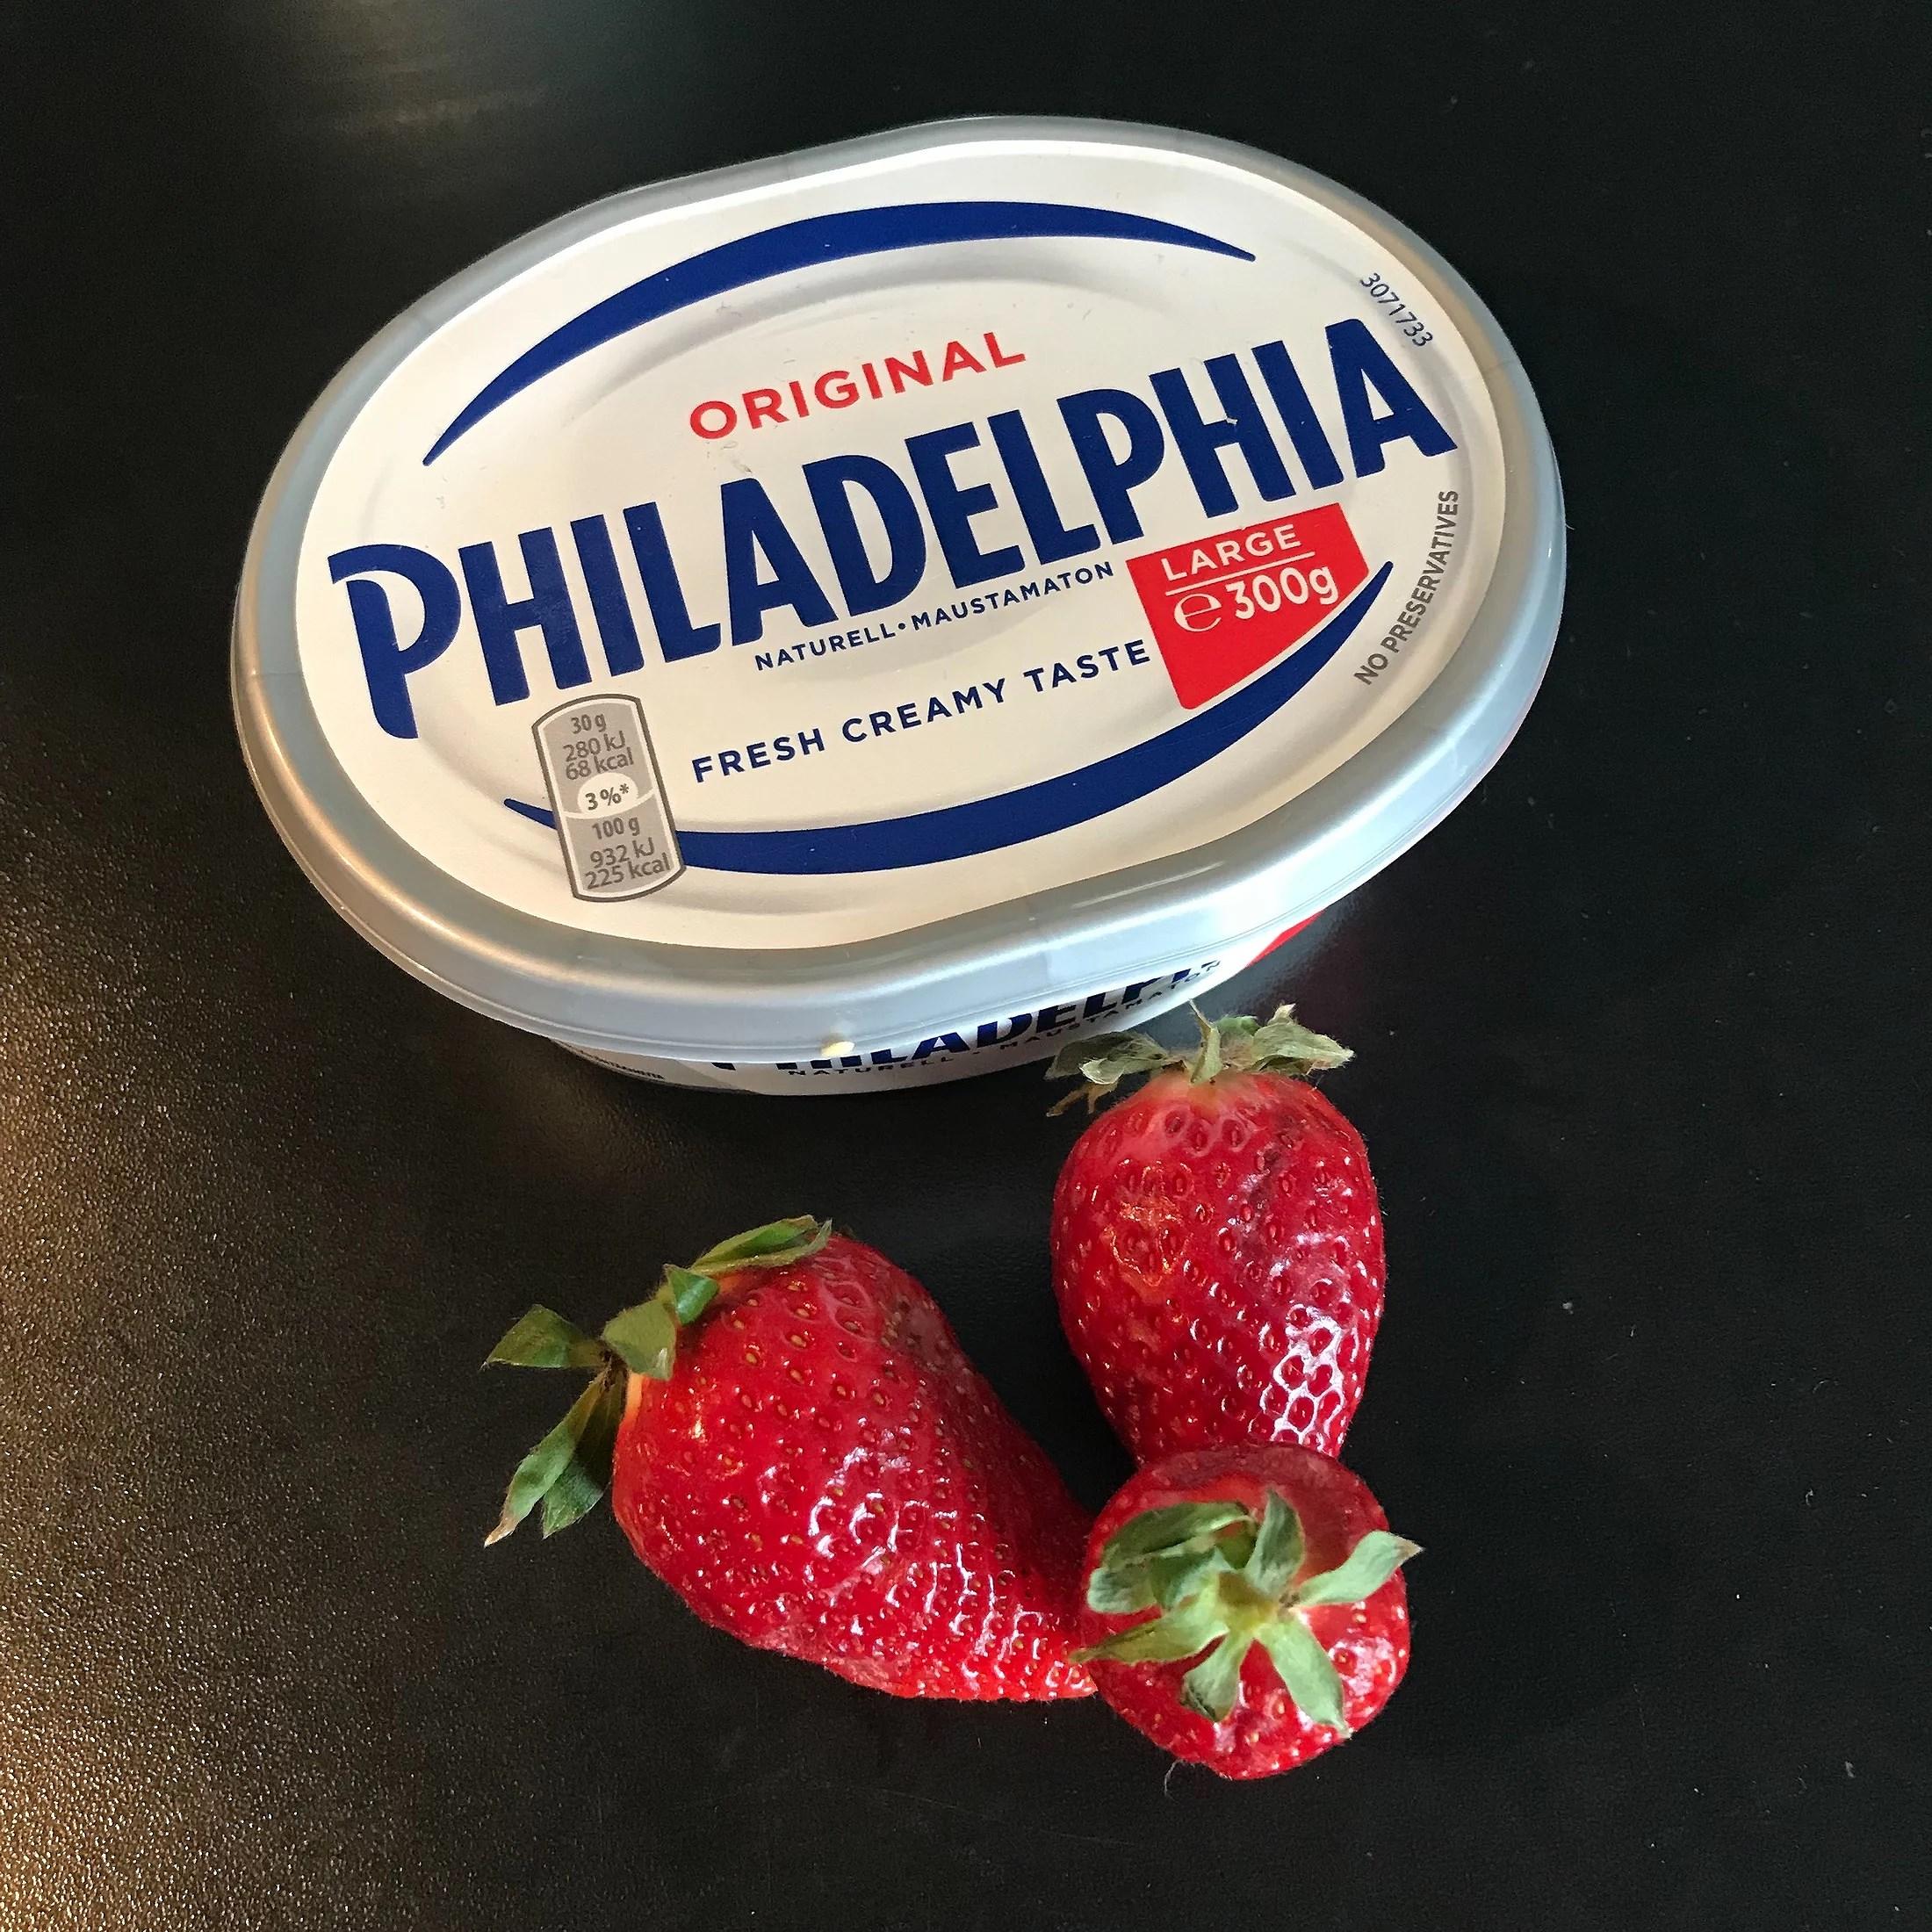 [cheesecake] klassisk variant